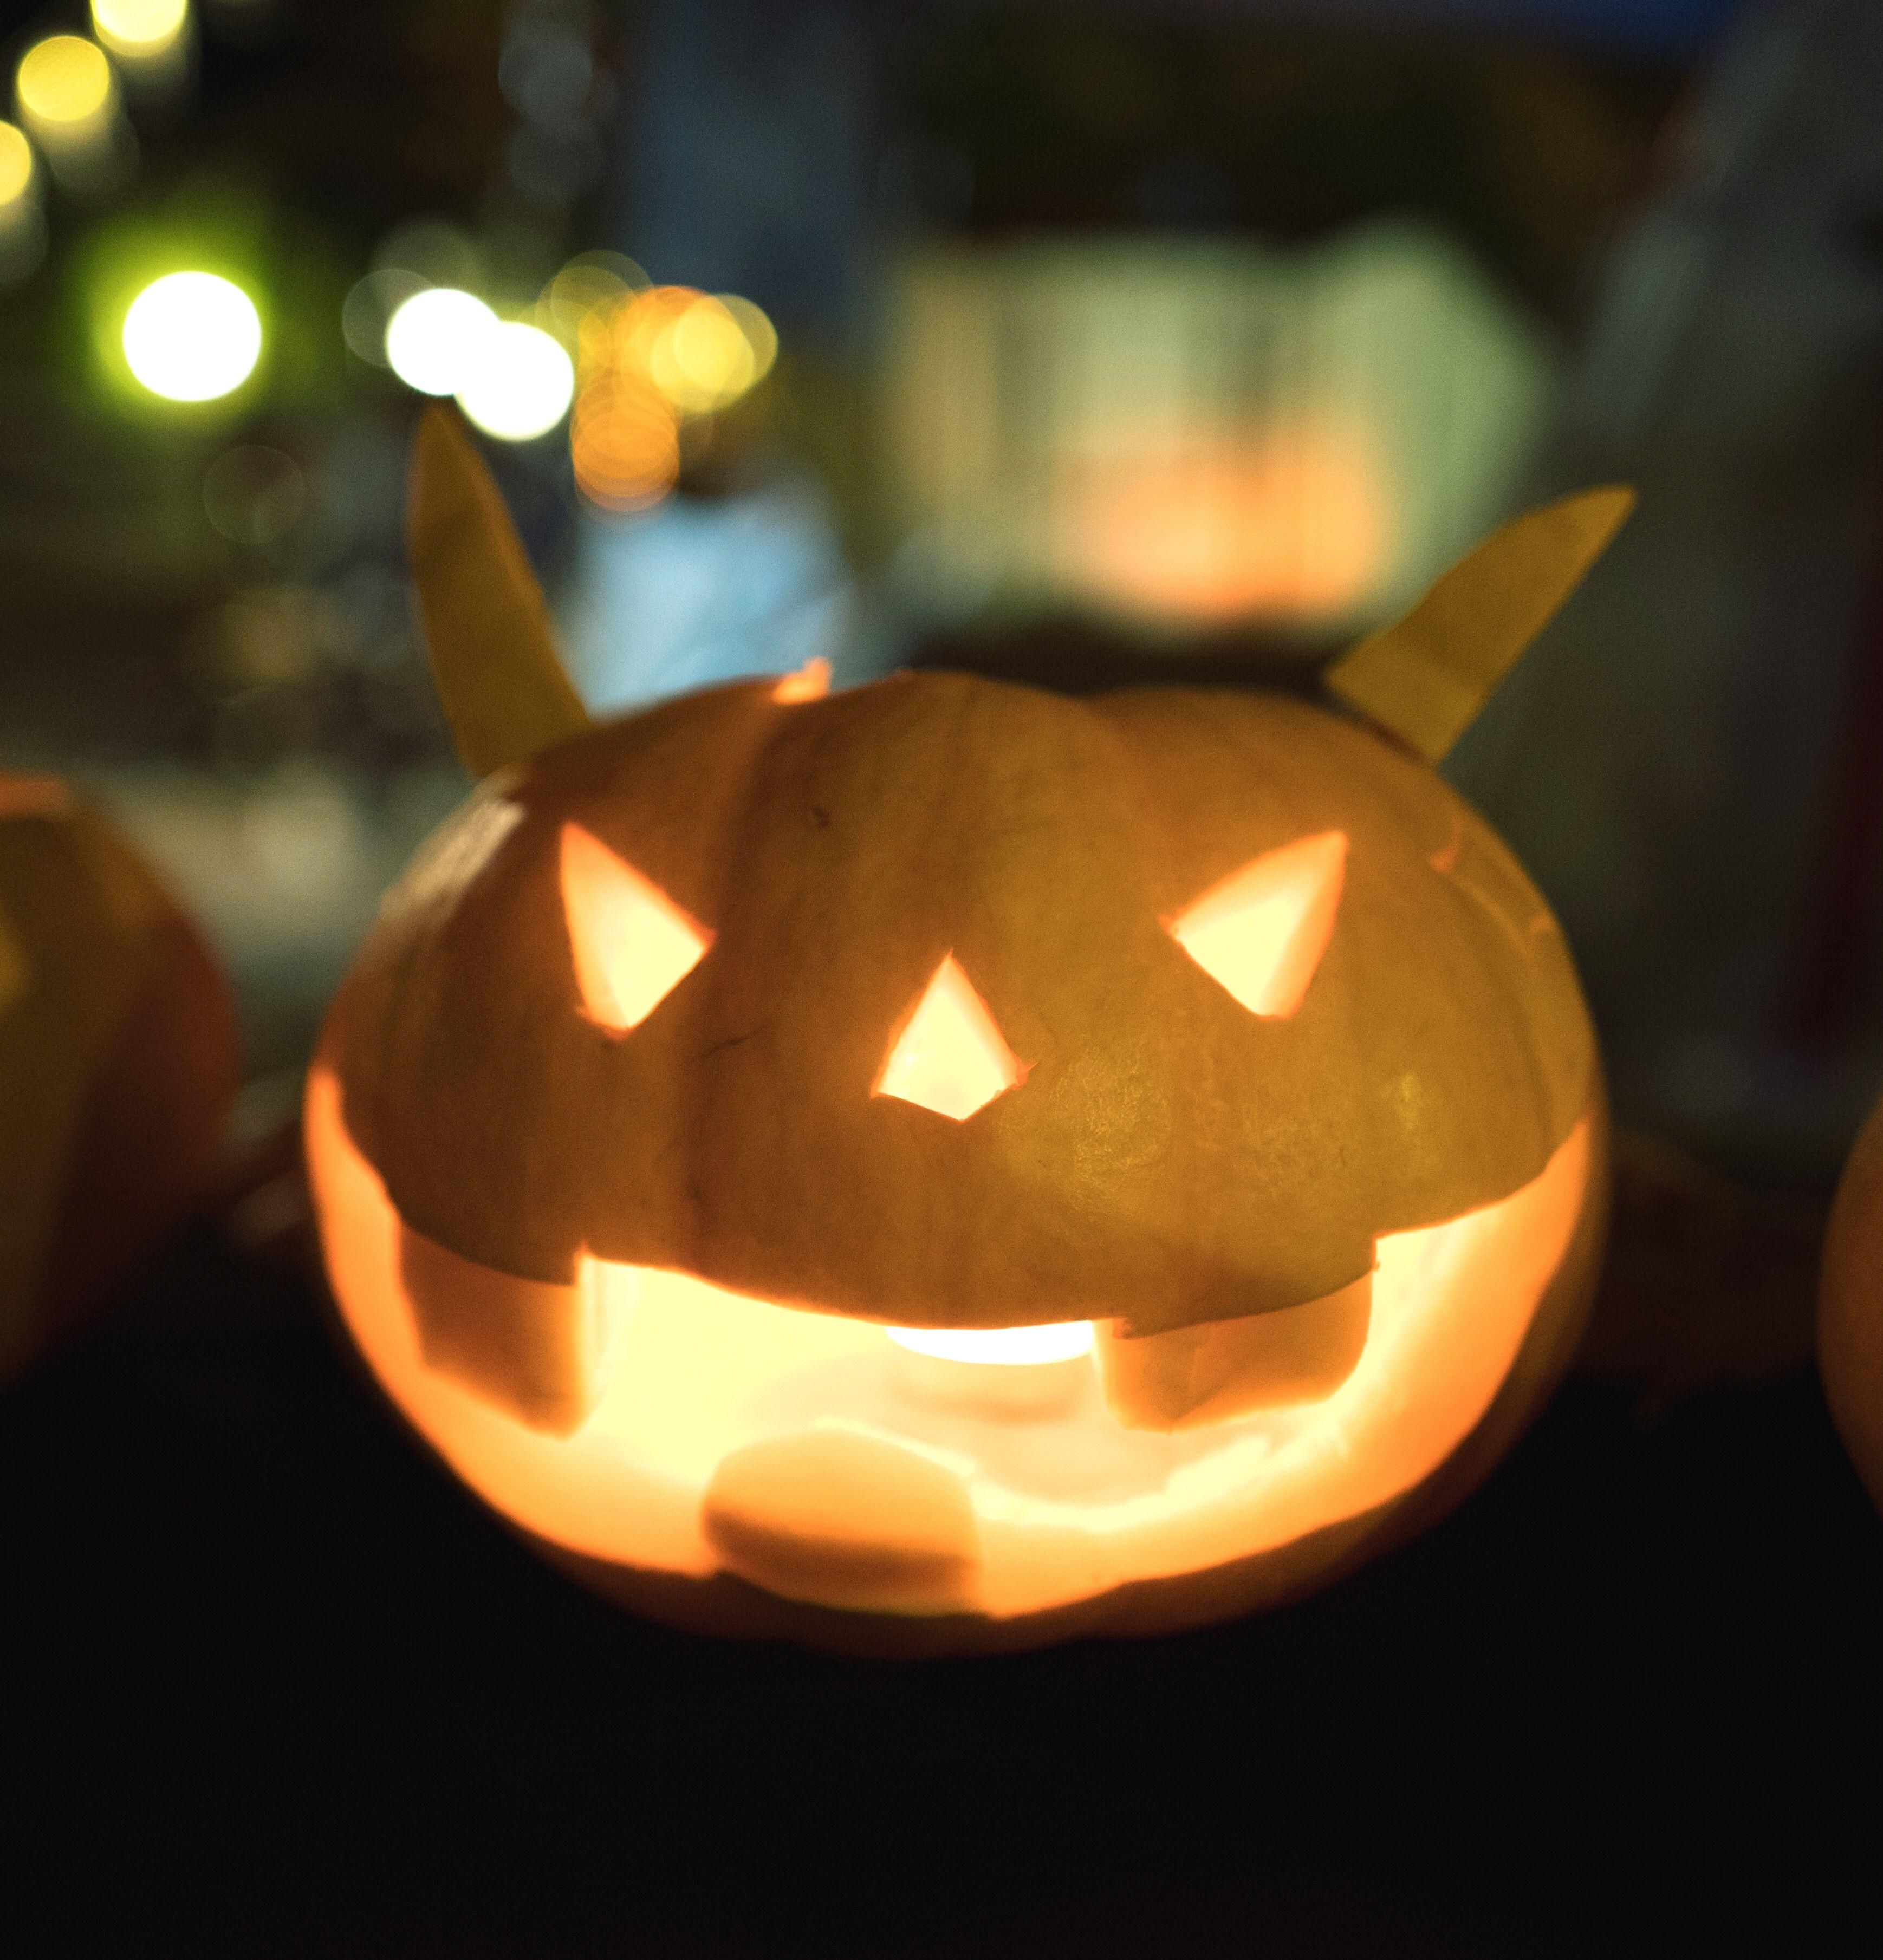 50 Easy Pumpkin Carving Ideas Creative Pumpkin Designs